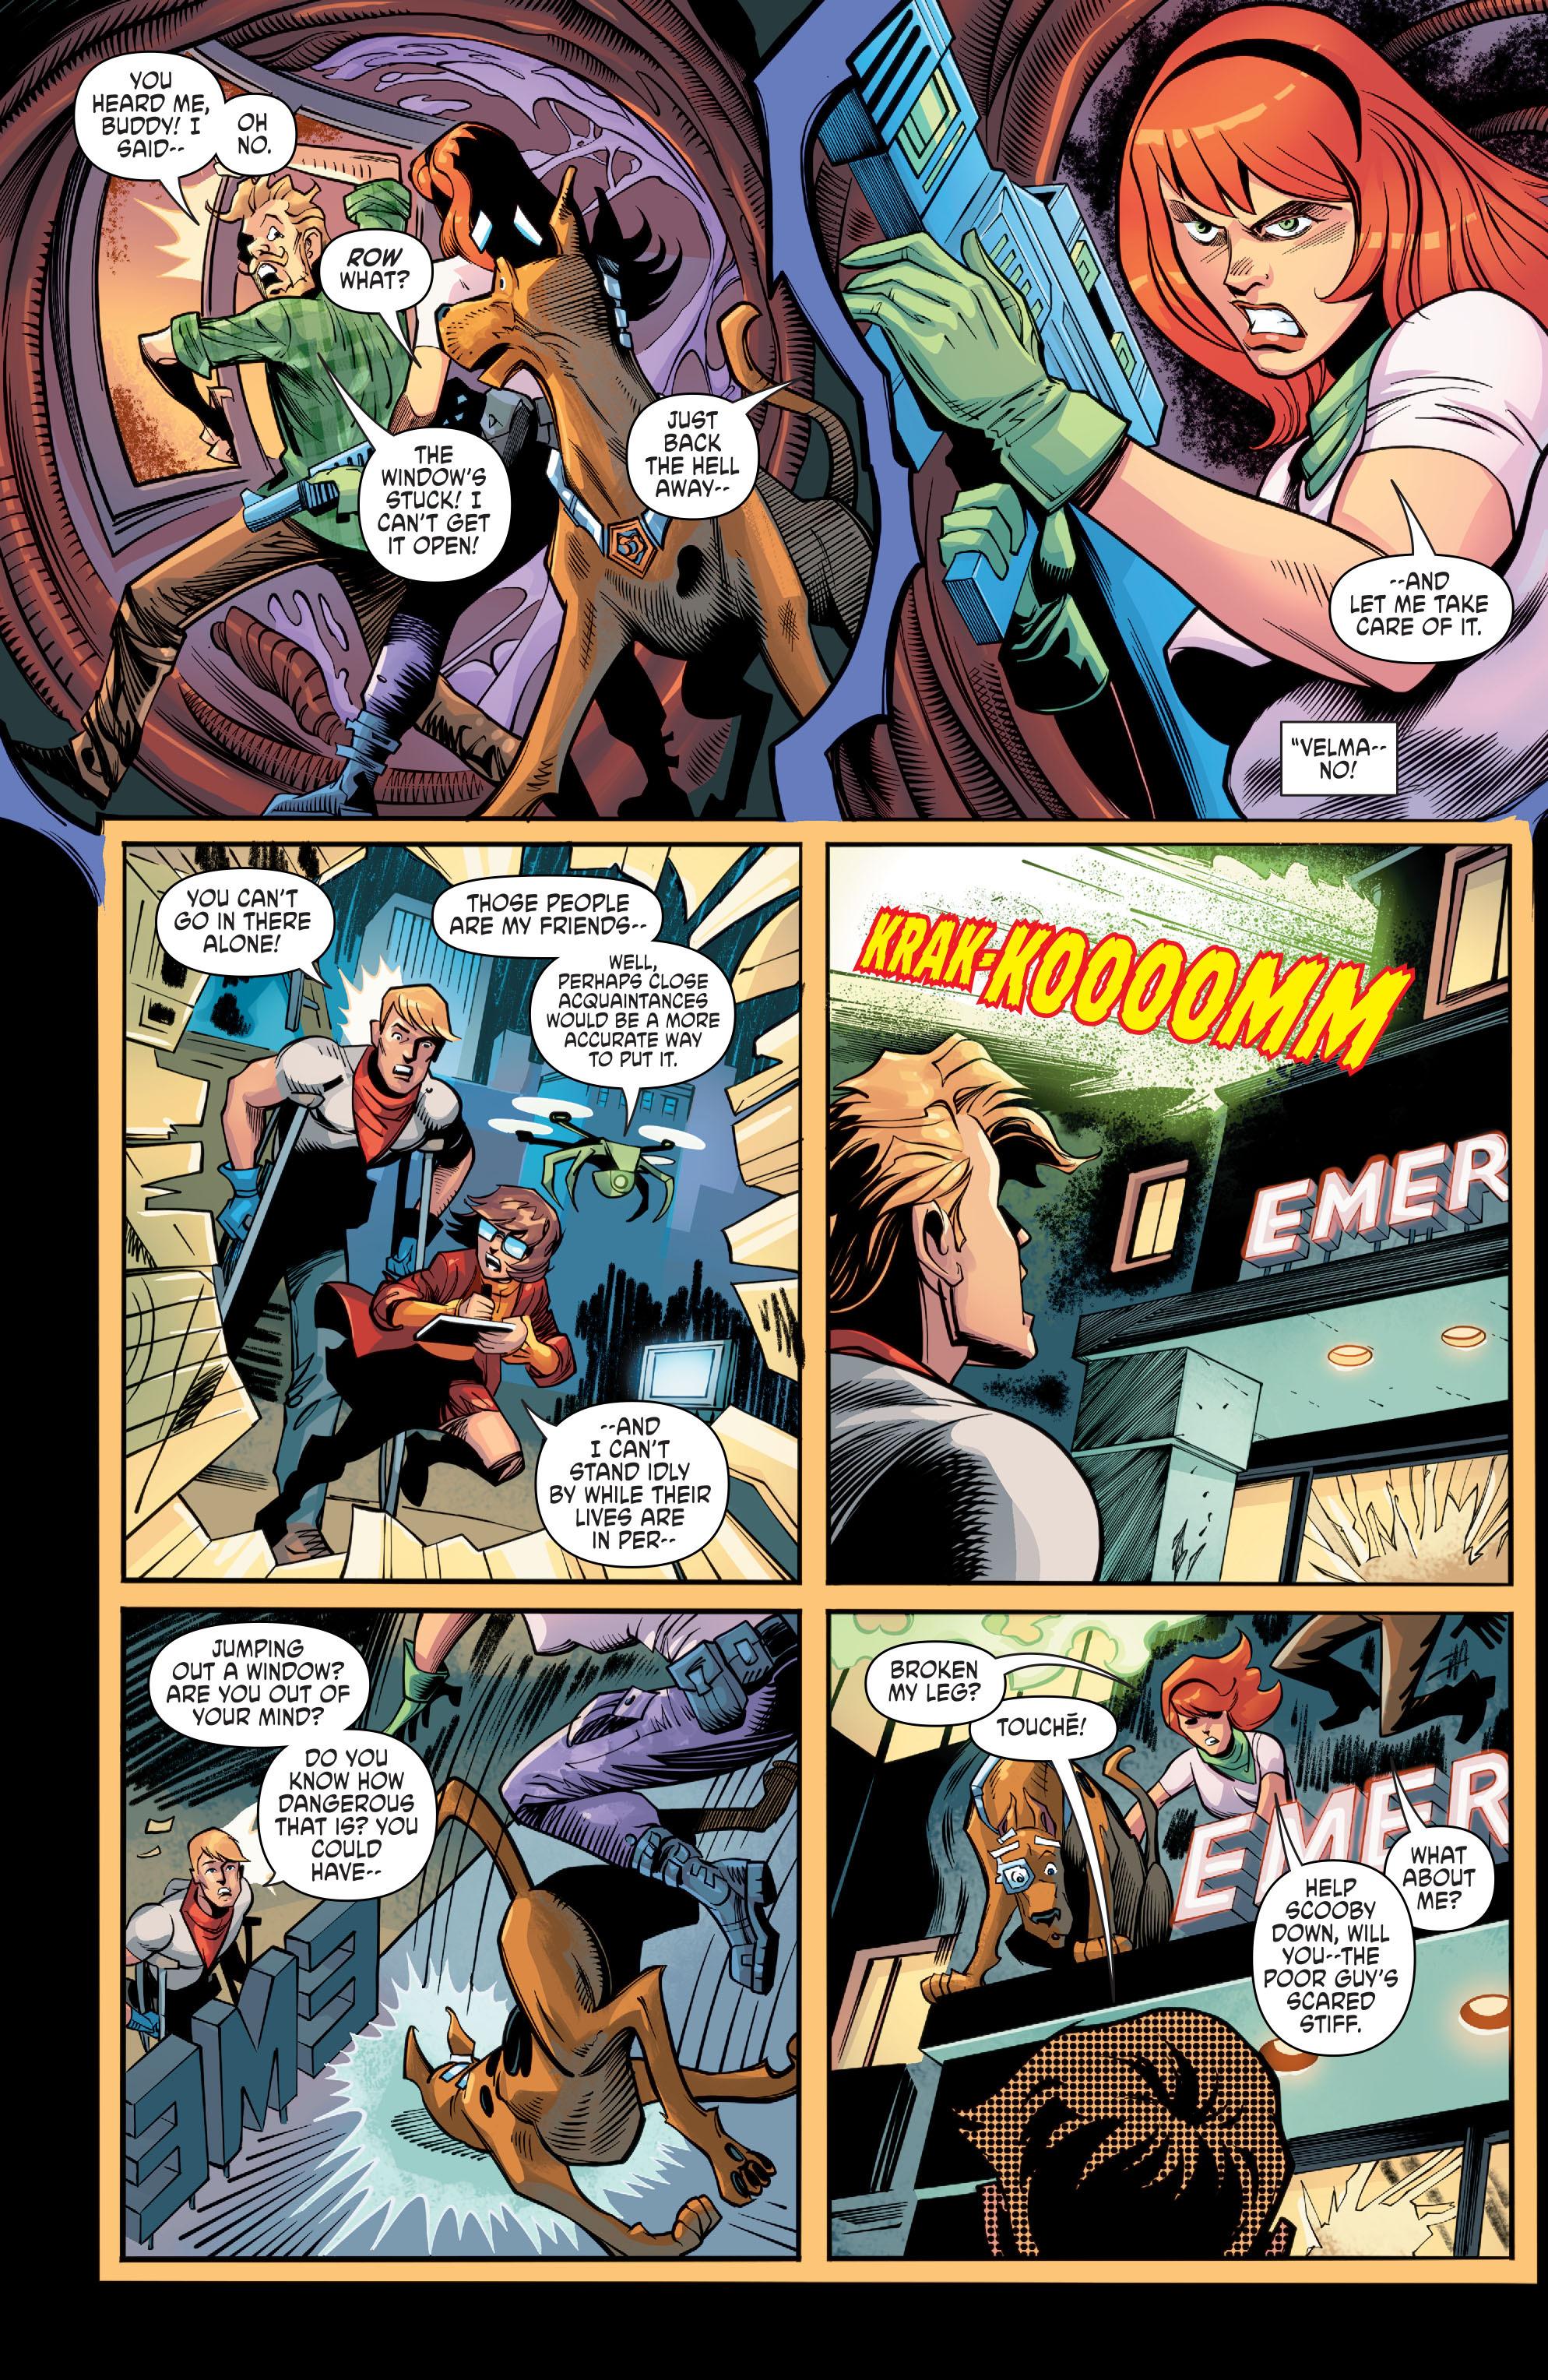 Read online Scooby Apocalypse comic -  Issue #8 - 22